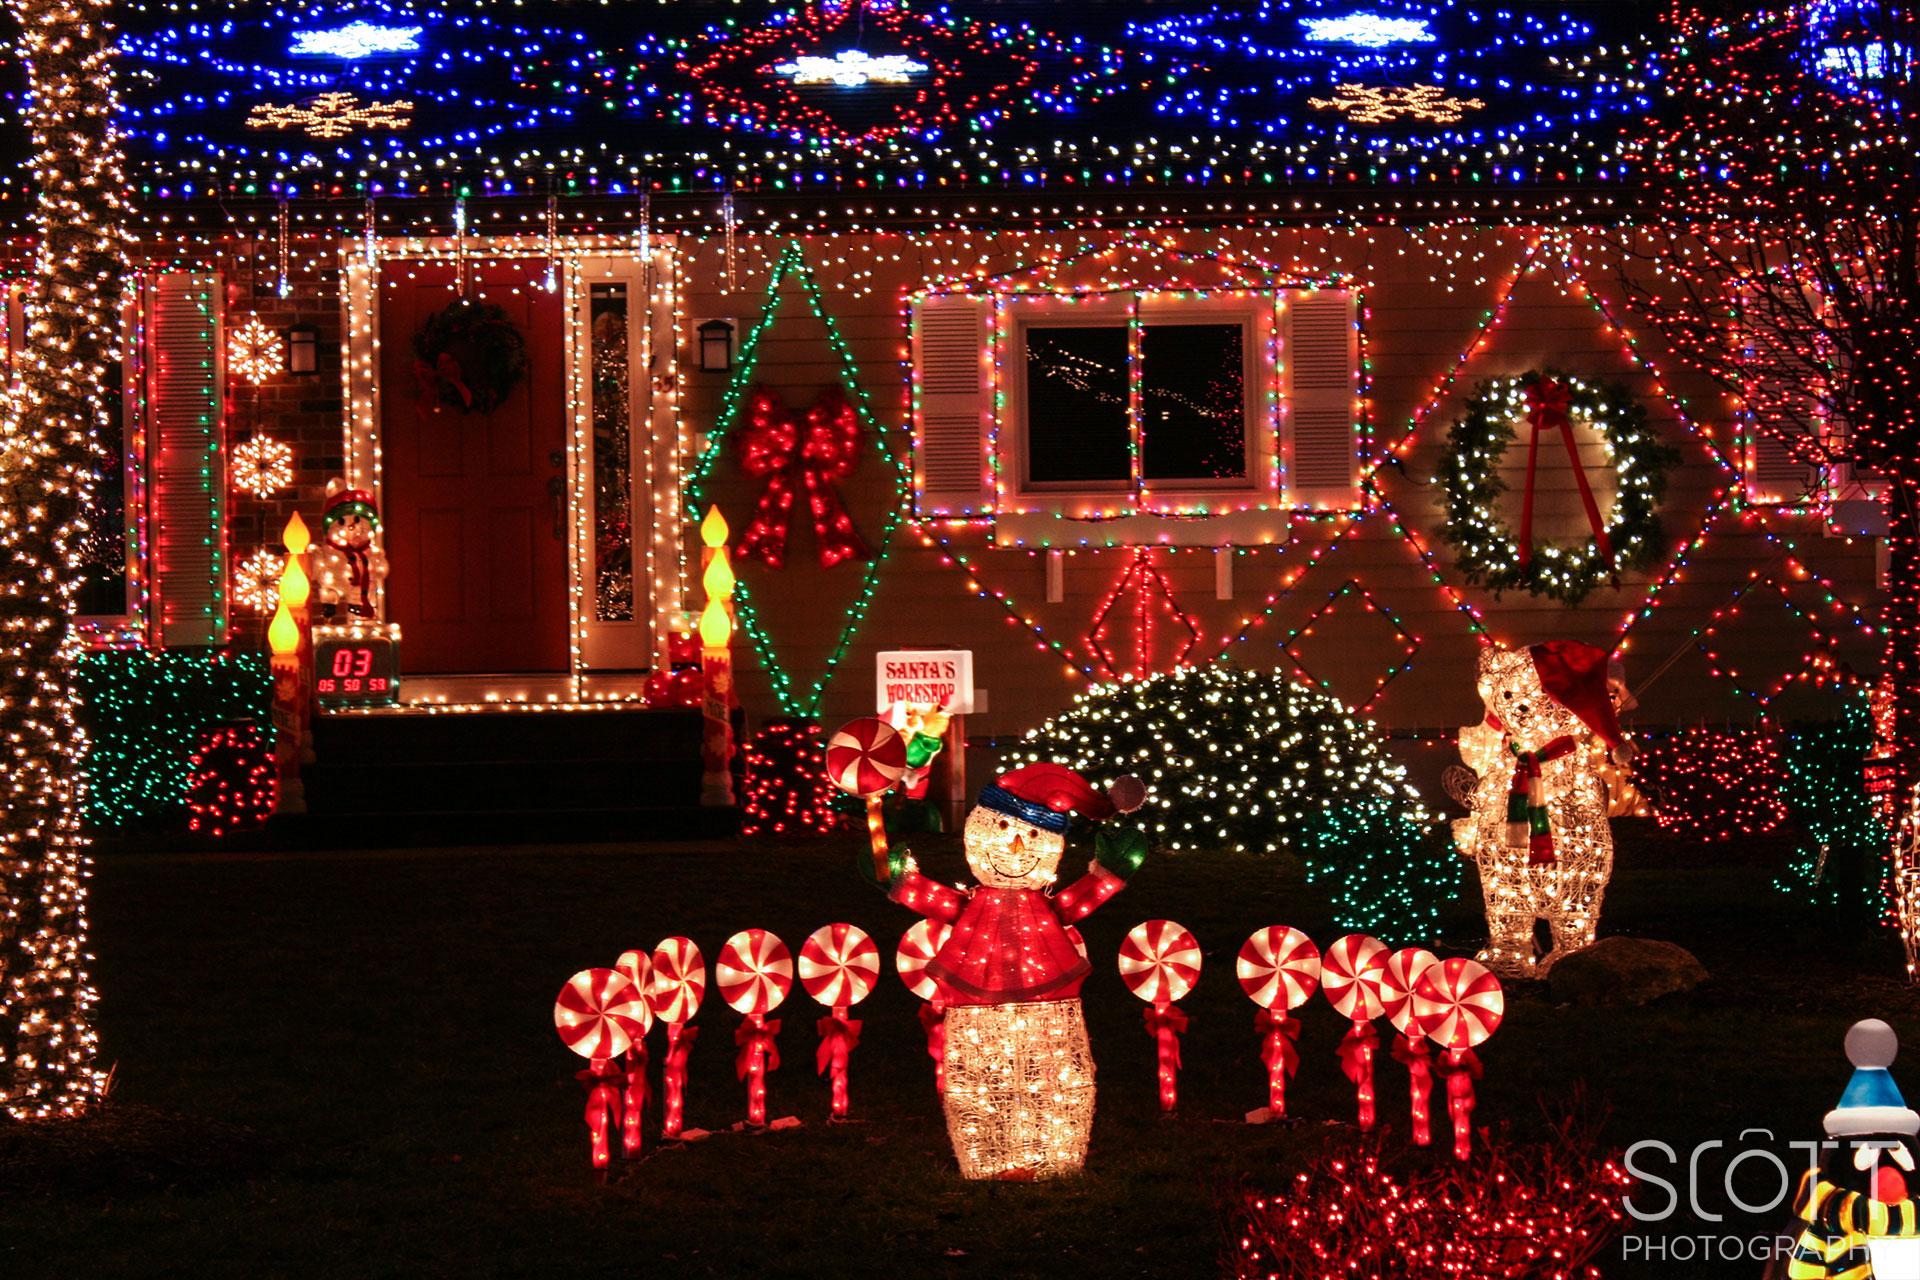 gillette-street-fairhaven-ma-christmas-lights-front-yard - Scott ...